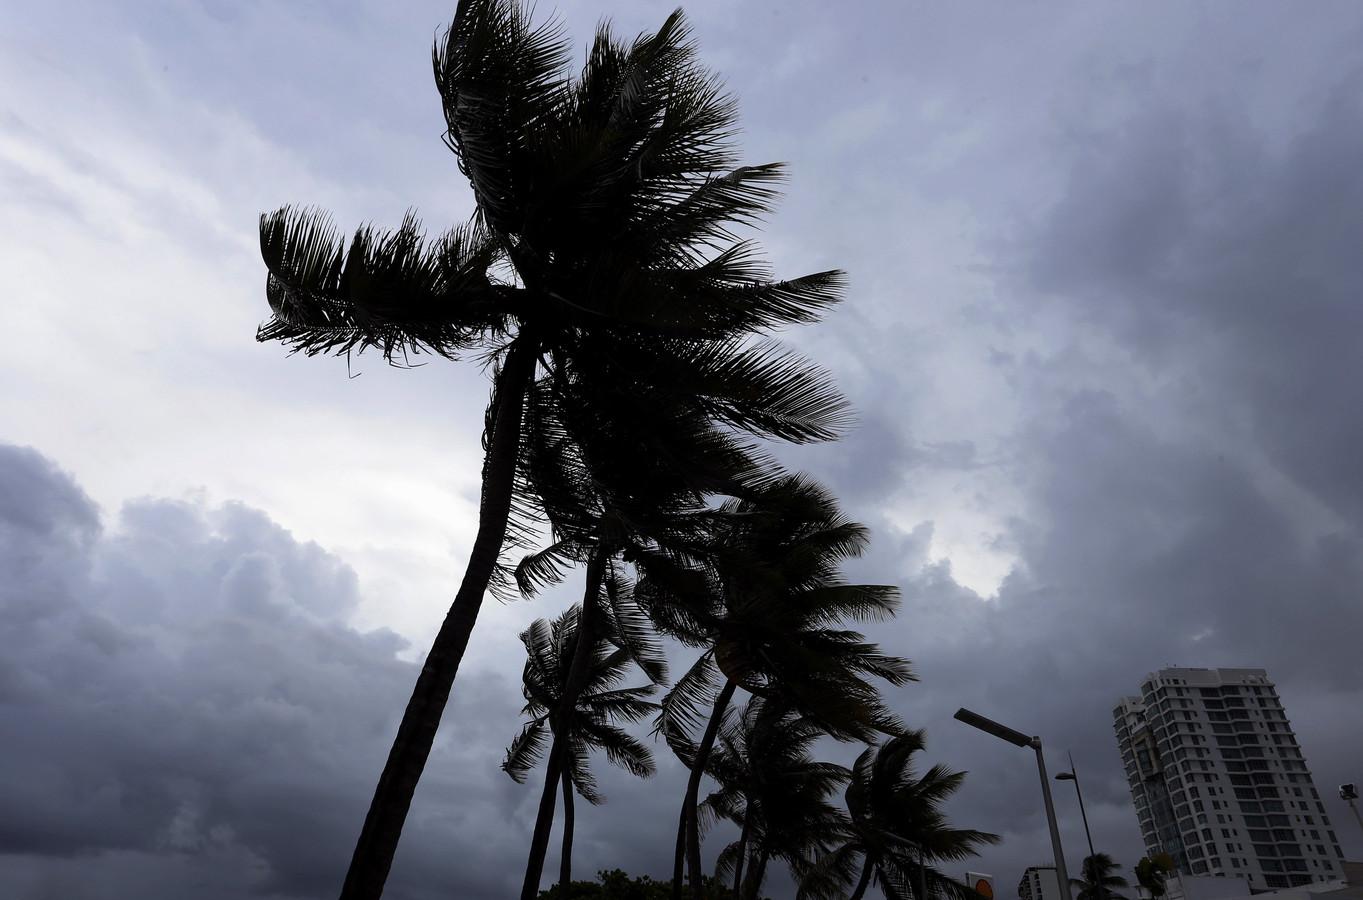 Donkere wolken boven Puerto Rico.